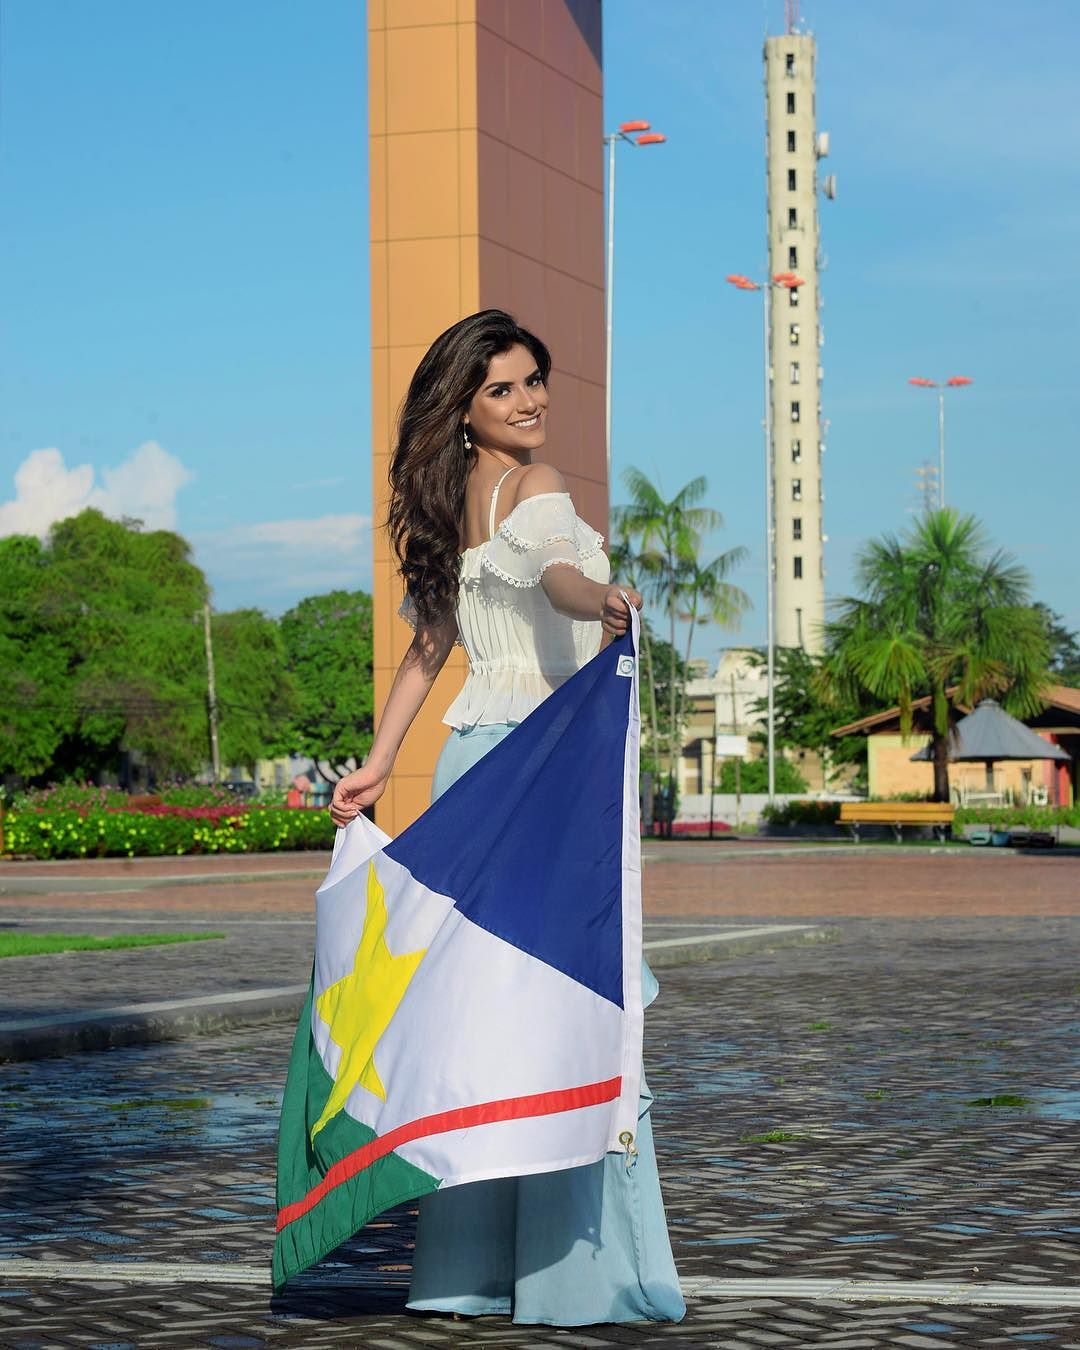 miss continentes unidos 2015: nathalia lago. miss roraima universo 2017. - Página 3 20634012